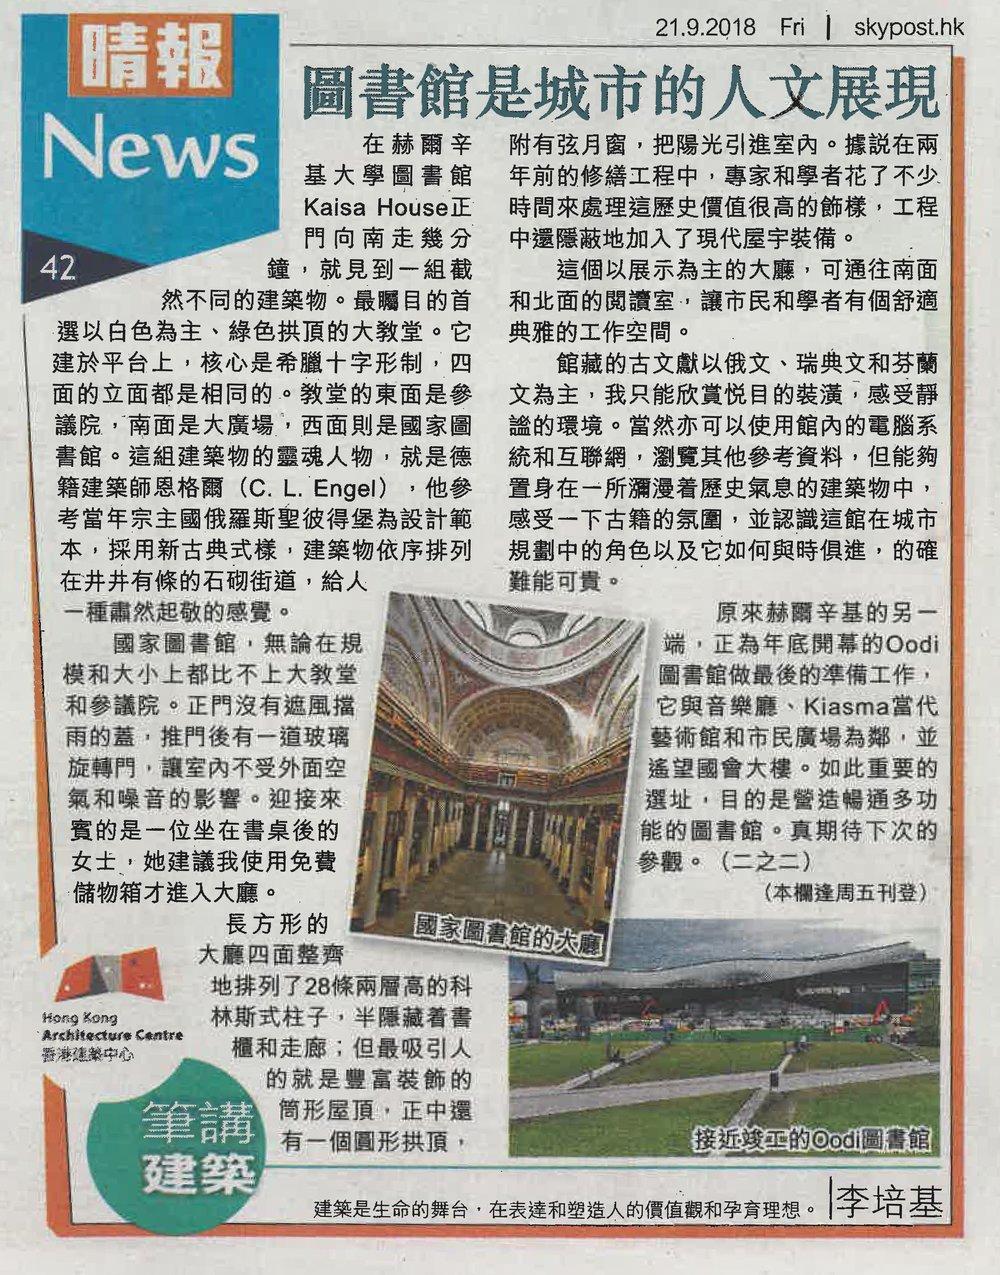 Skypost_180921_李培基_圖書館是城市的人文展現_Resize.jpg